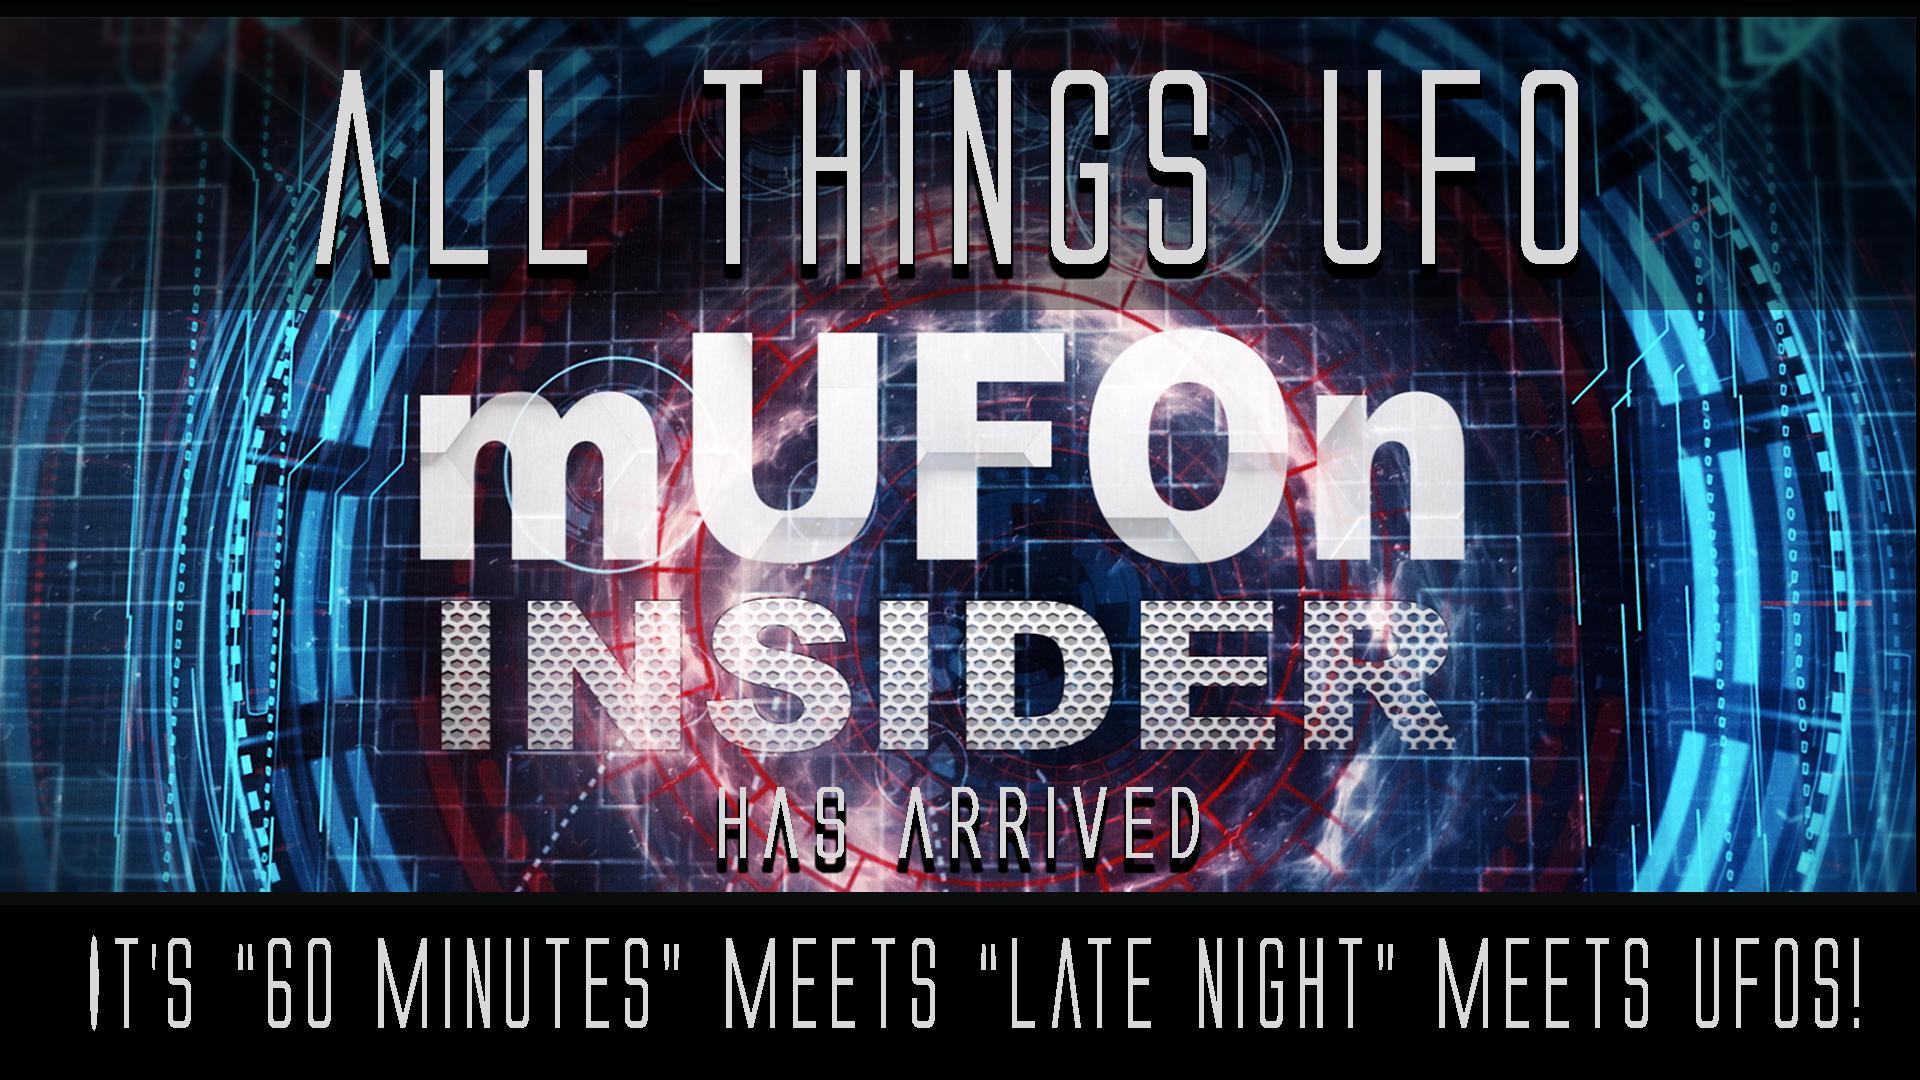 mUFOn Insider - All things UFO